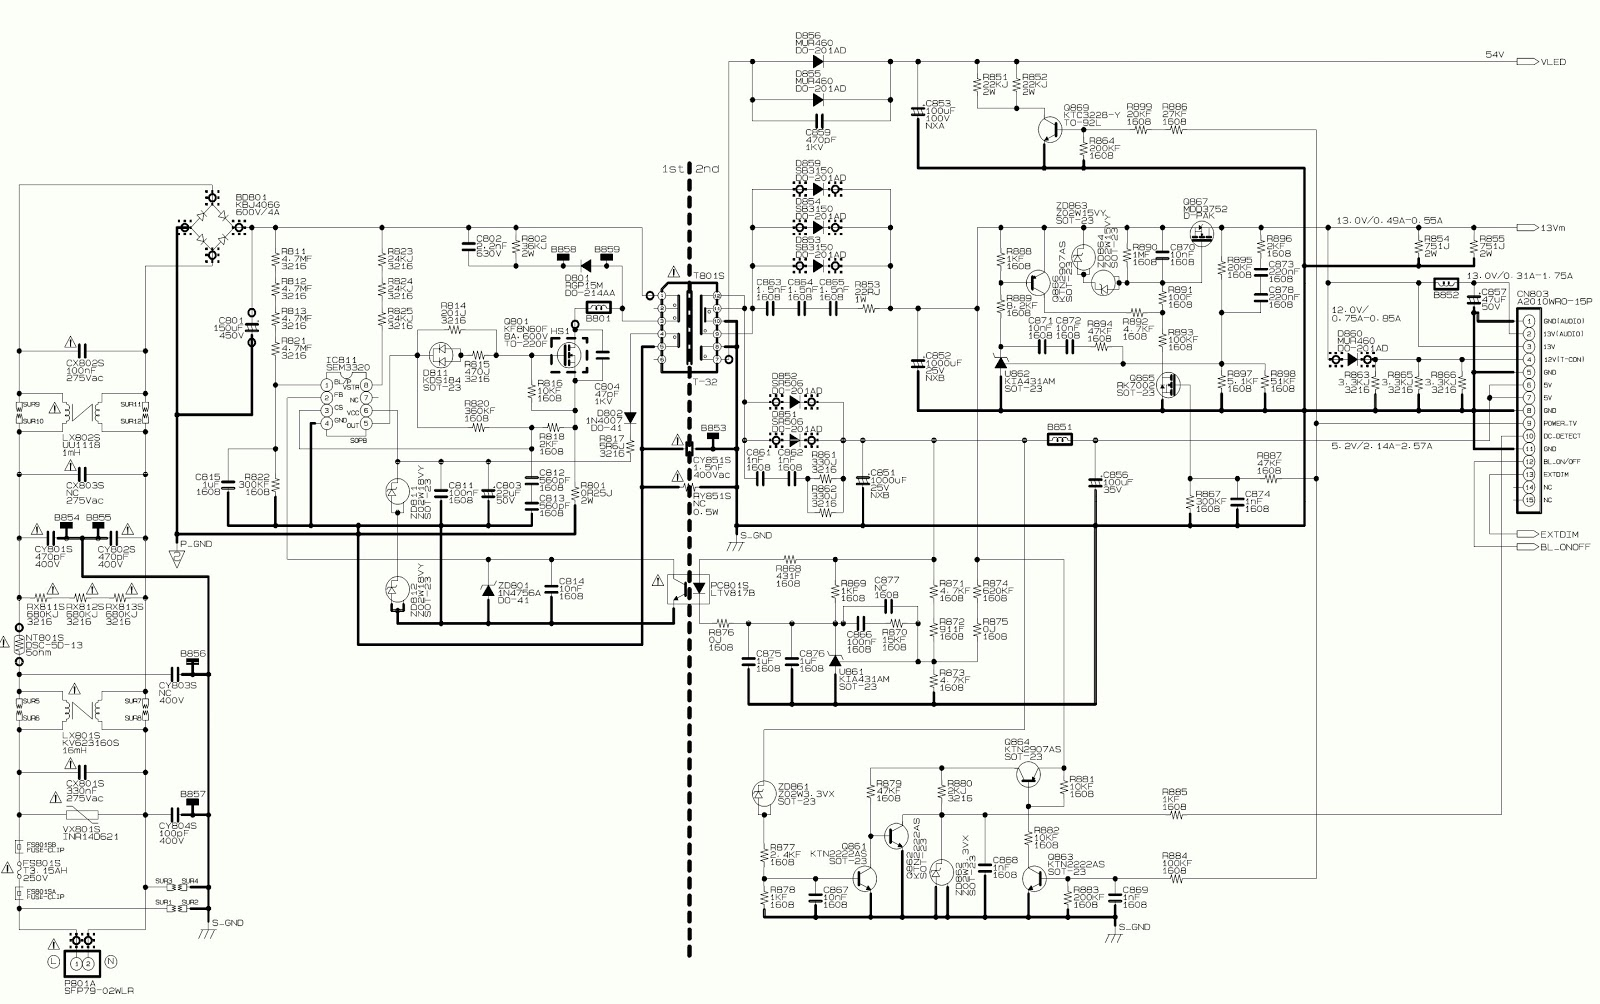 toshiba 39l2300 toshiba 32l2300 smps circuit diagram power supply  [ 1600 x 1004 Pixel ]